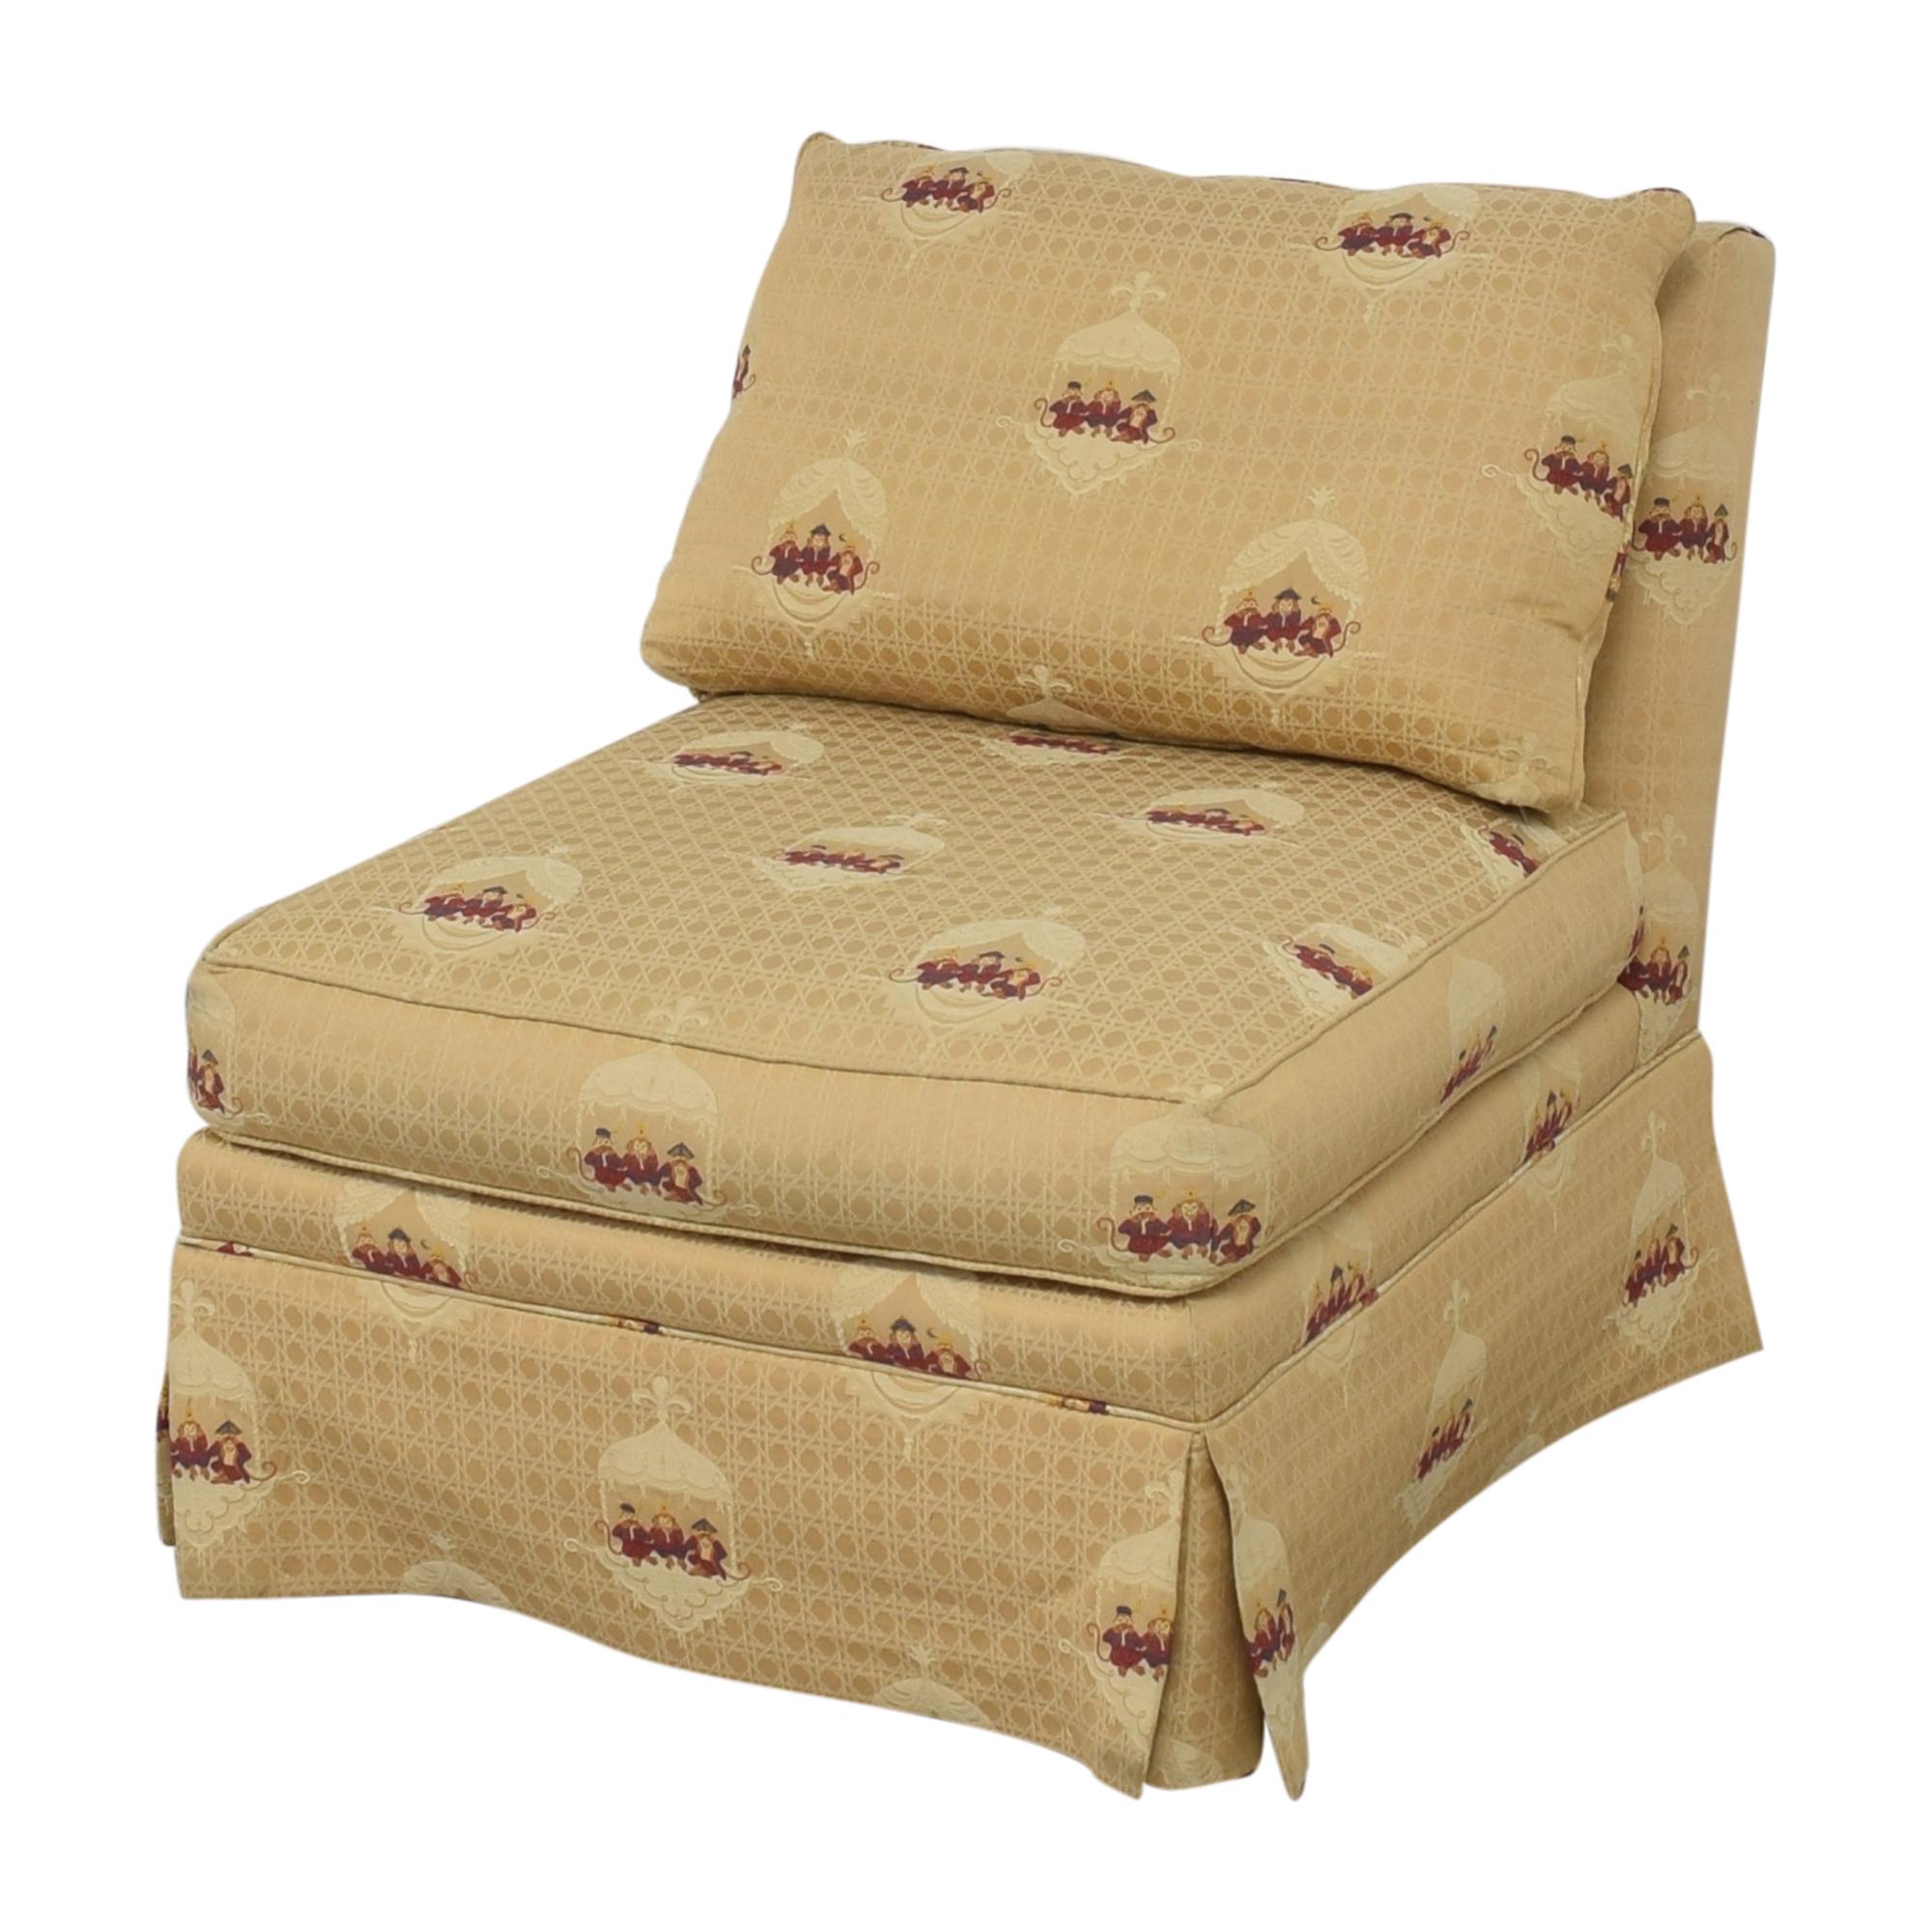 Sherrill Furniture Sherrill Brand Skirted Slipper Chair price